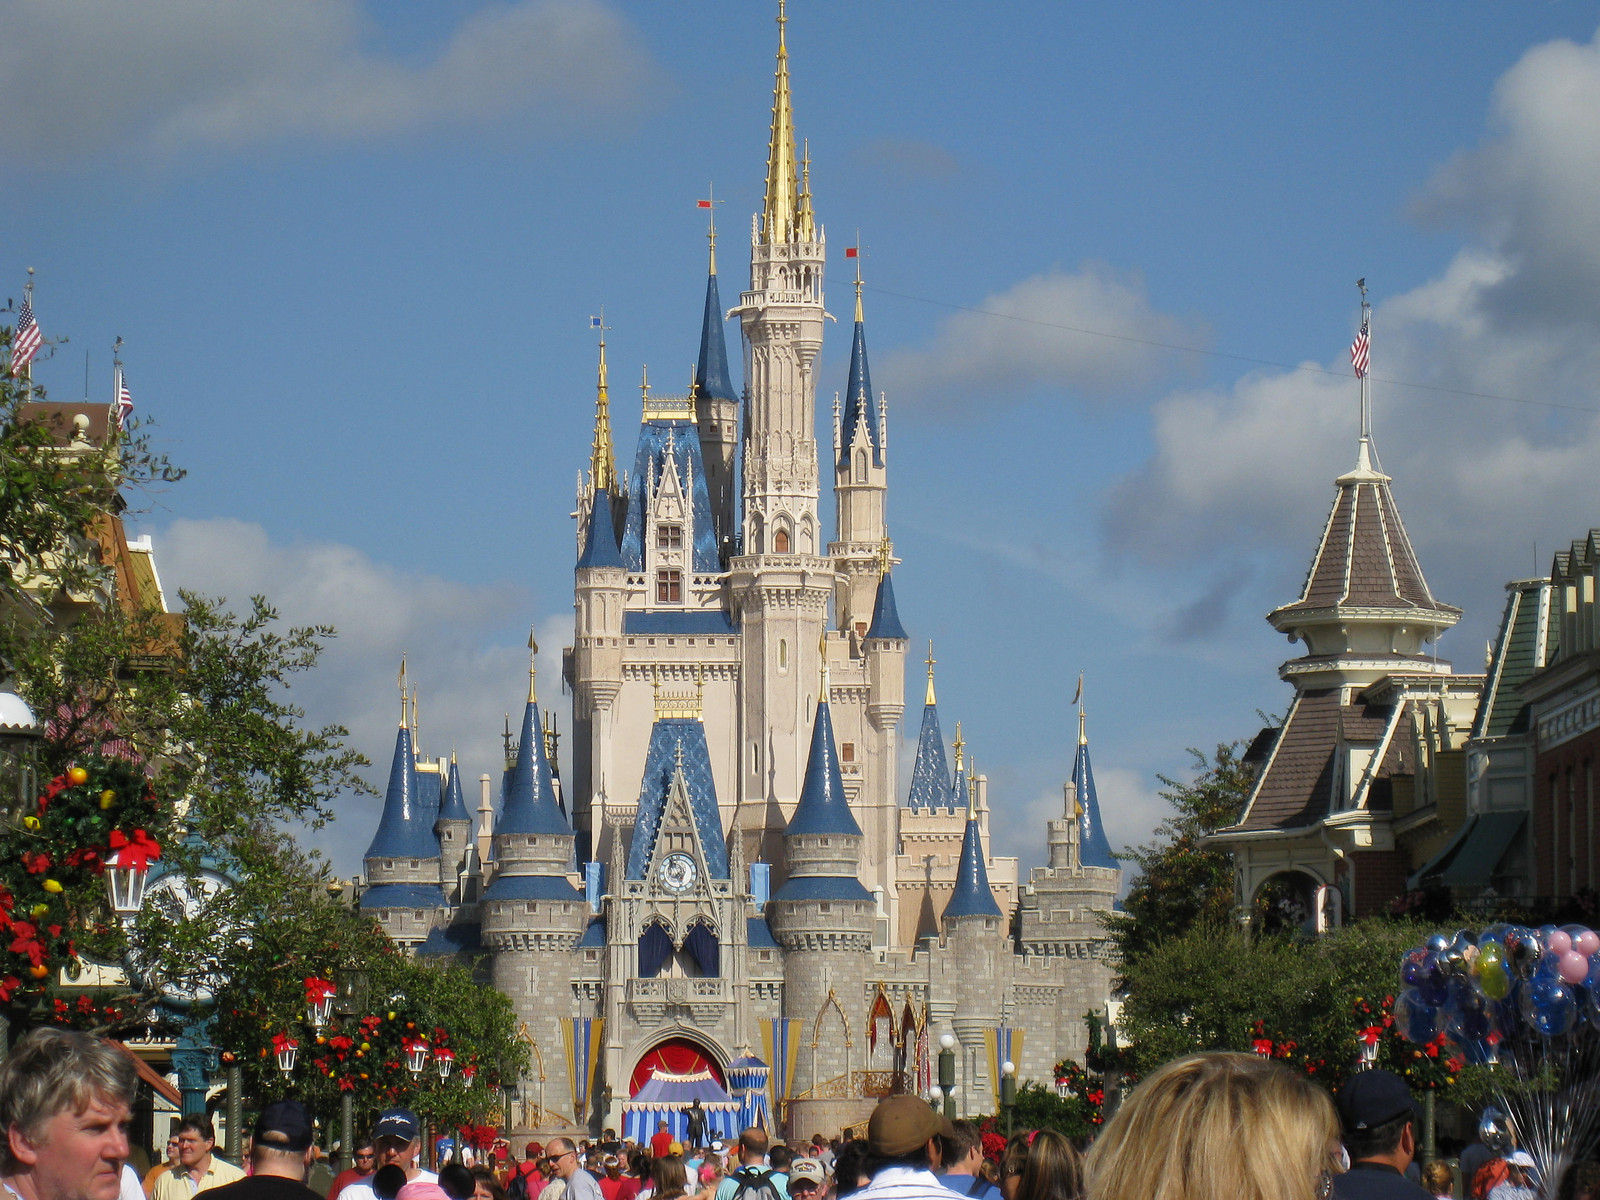 Walt Disney World Castle Wallpaper CityMochacom 1600x1200